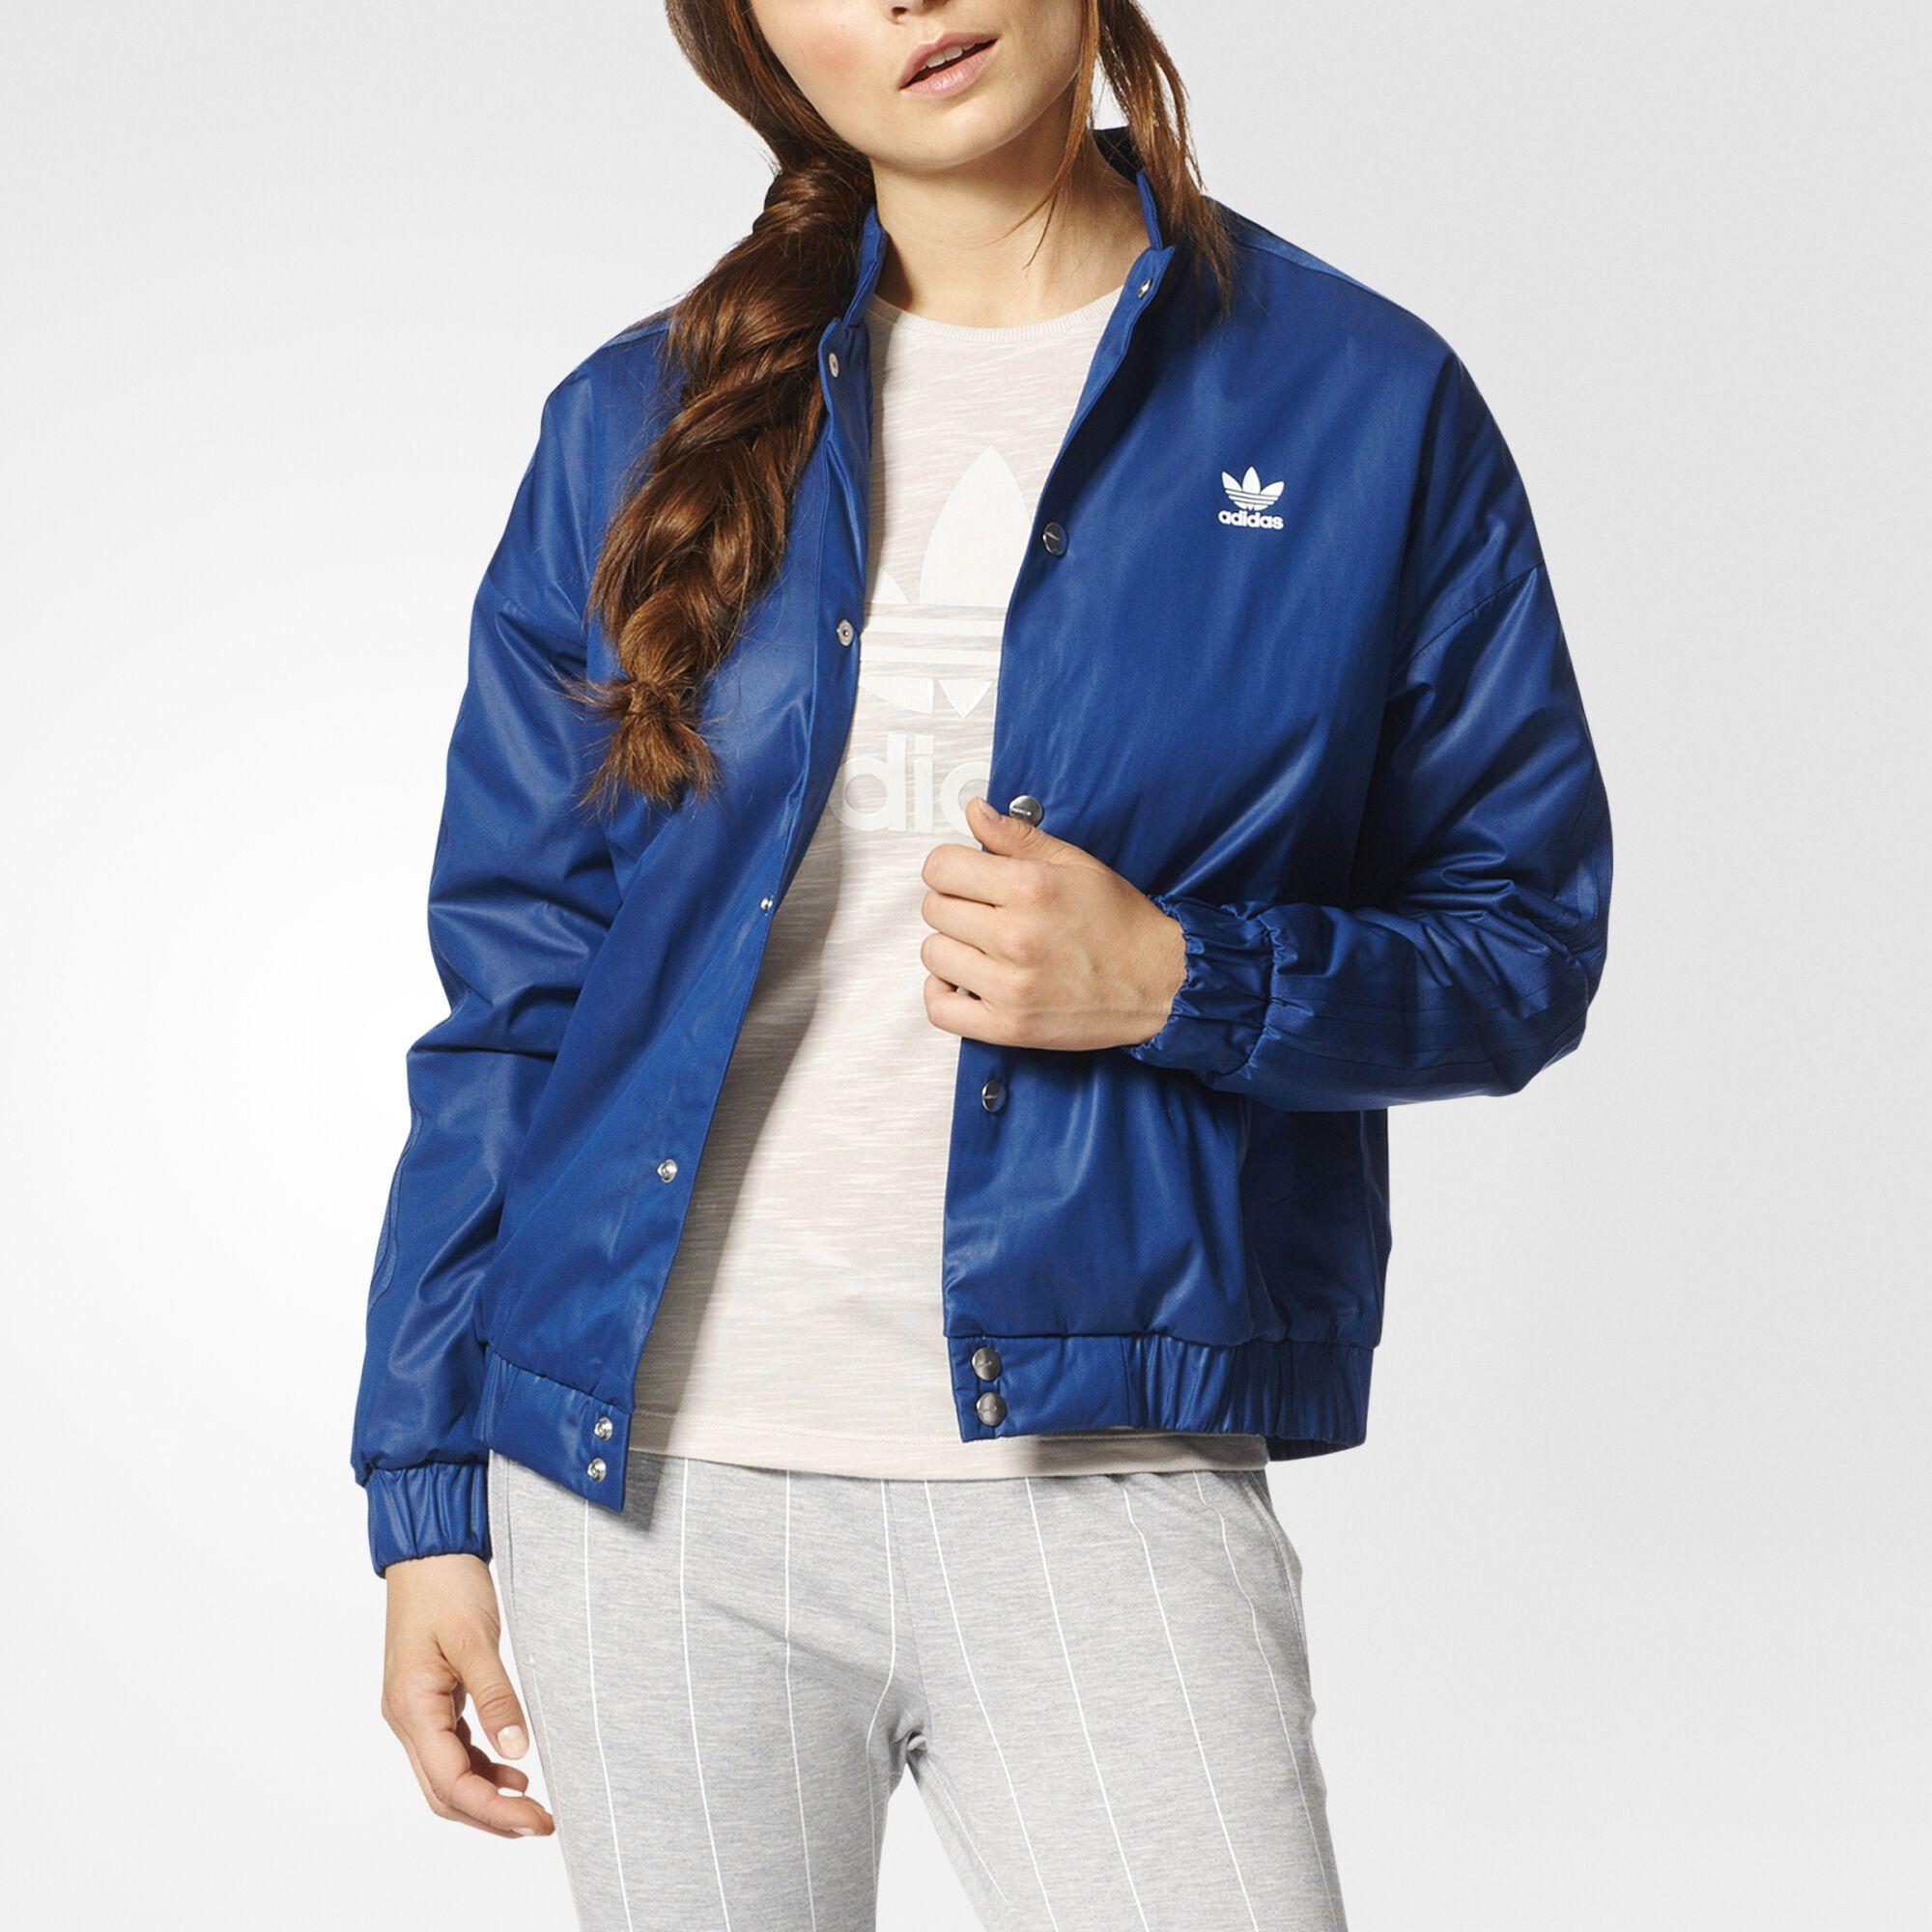 ADIDAS jacket women blue   Ravenol